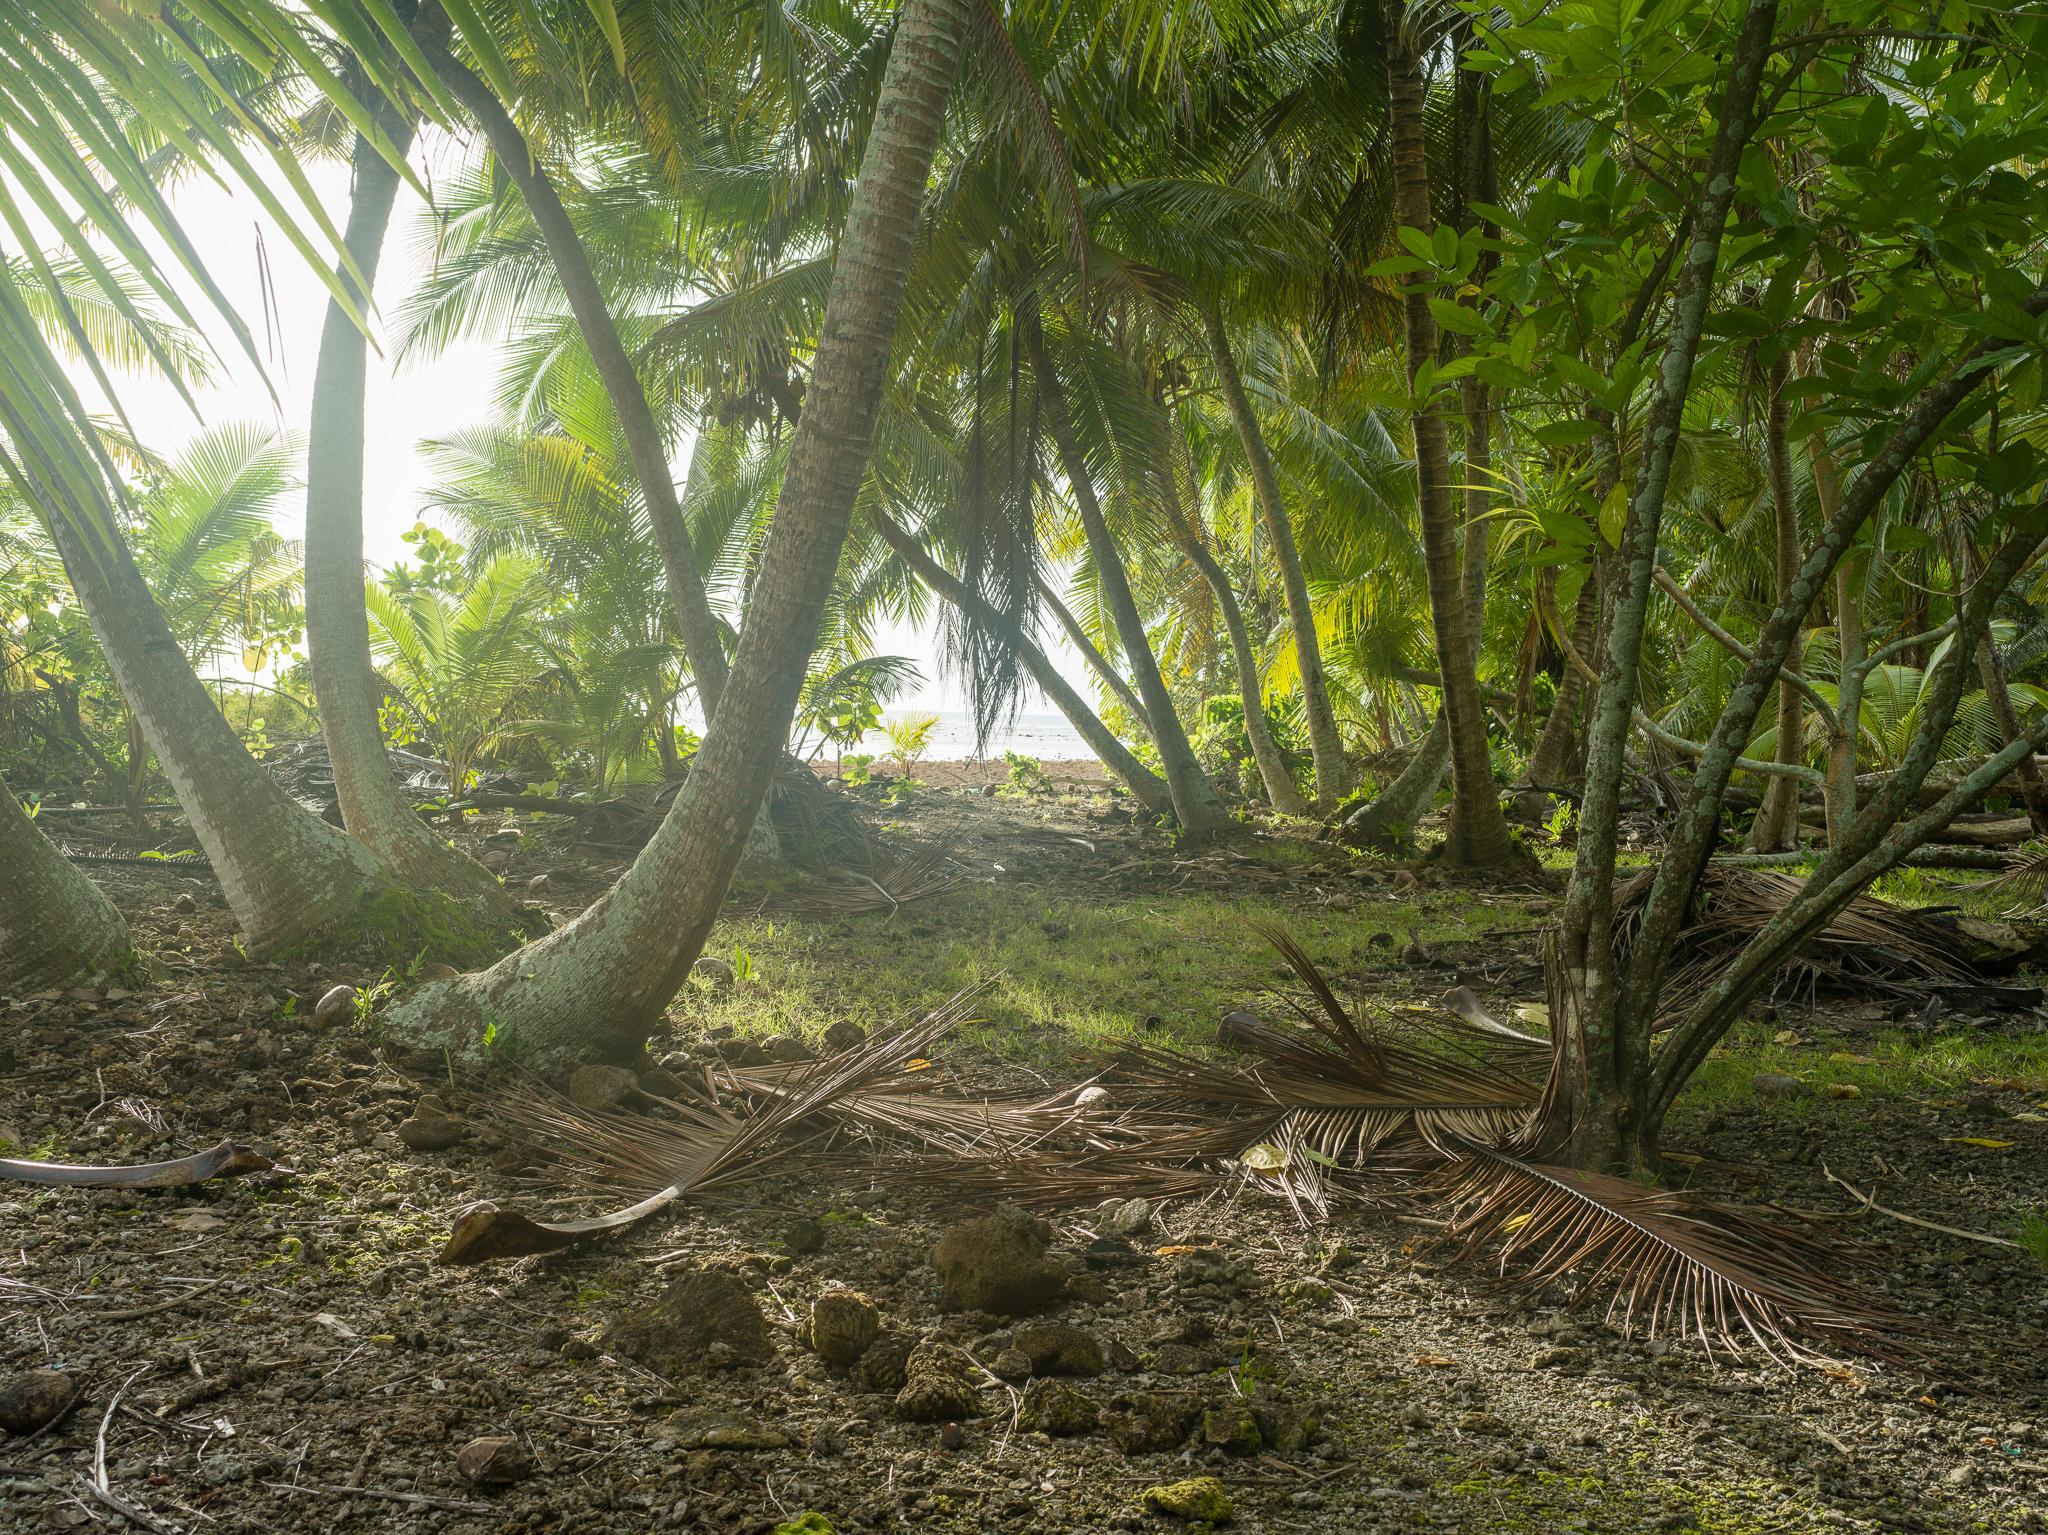 The jungle, Enedrik-Kan Island, Milli Atoll, Marshall Islands_Matthew Arnold